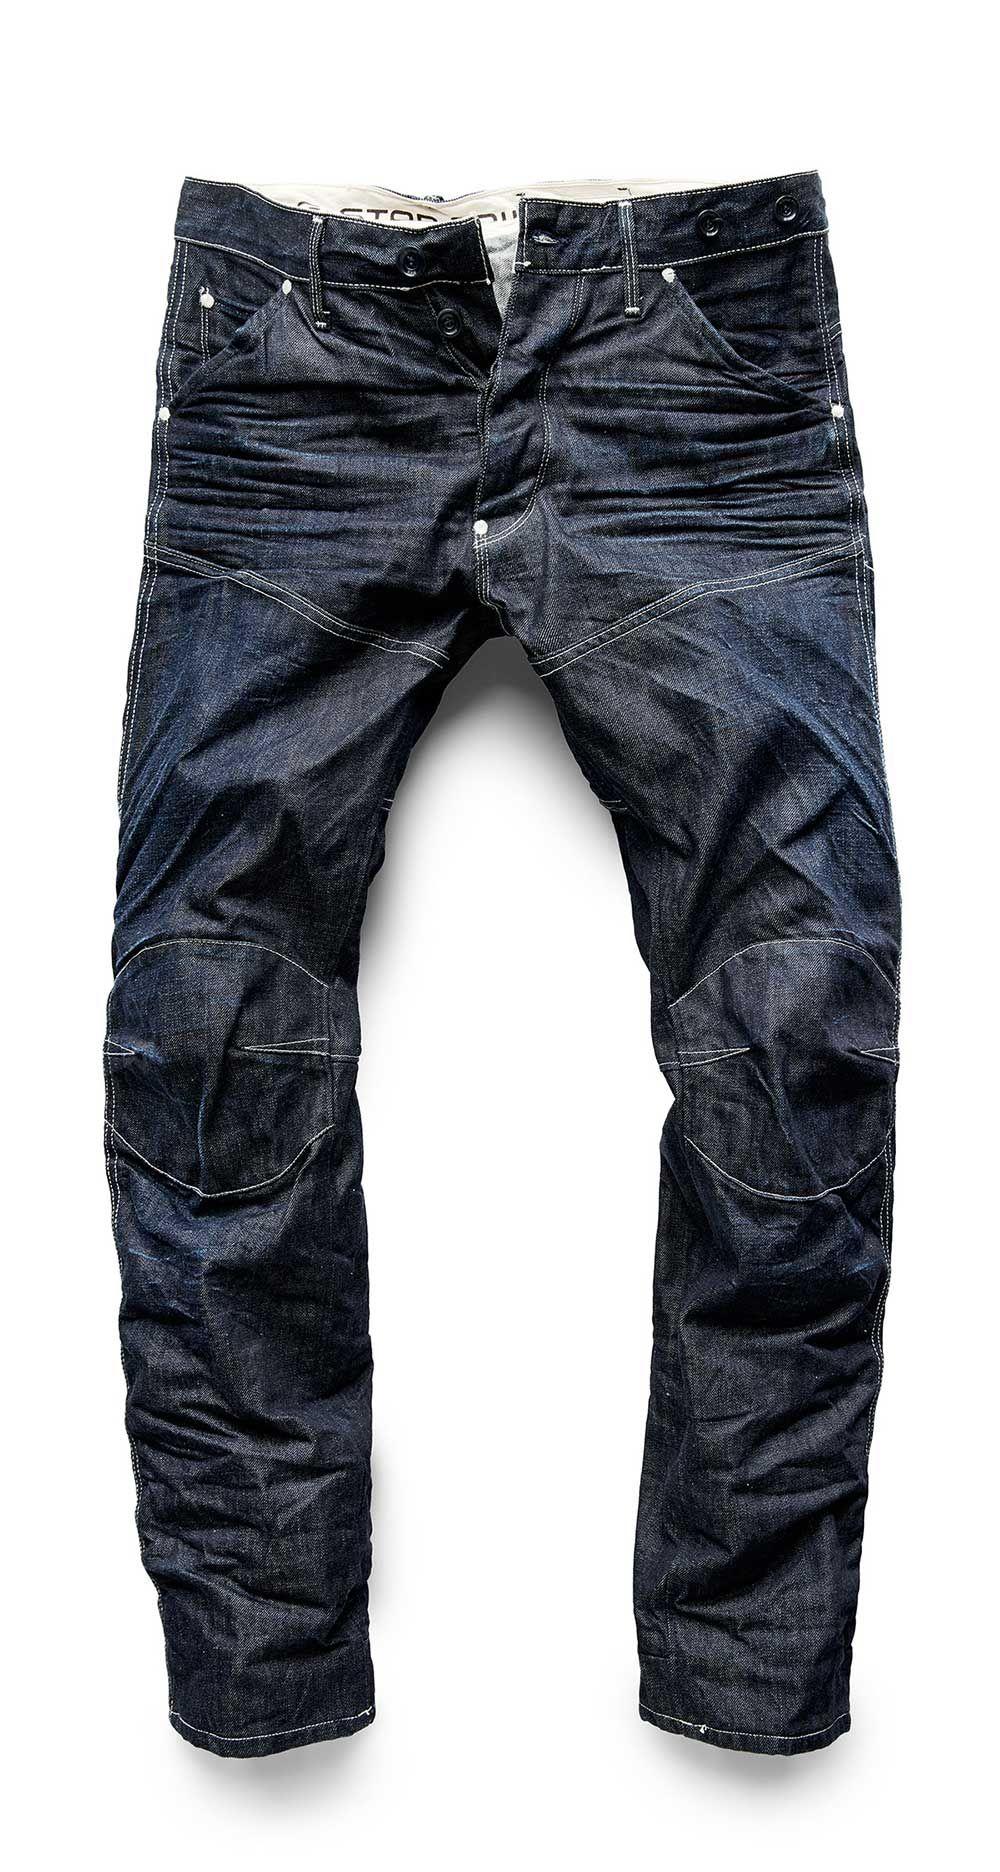 g star raw 3d elwood heritage narrow organic jeans jeans. Black Bedroom Furniture Sets. Home Design Ideas